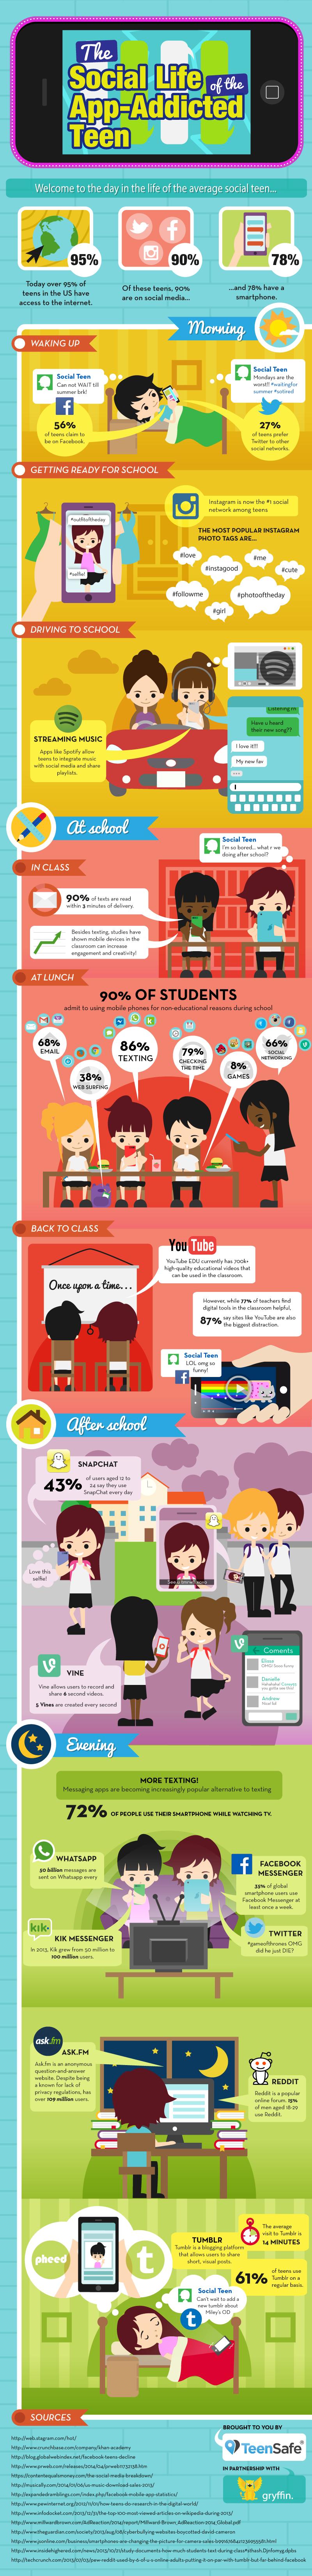 Social Life of App Addicted Teen (2)